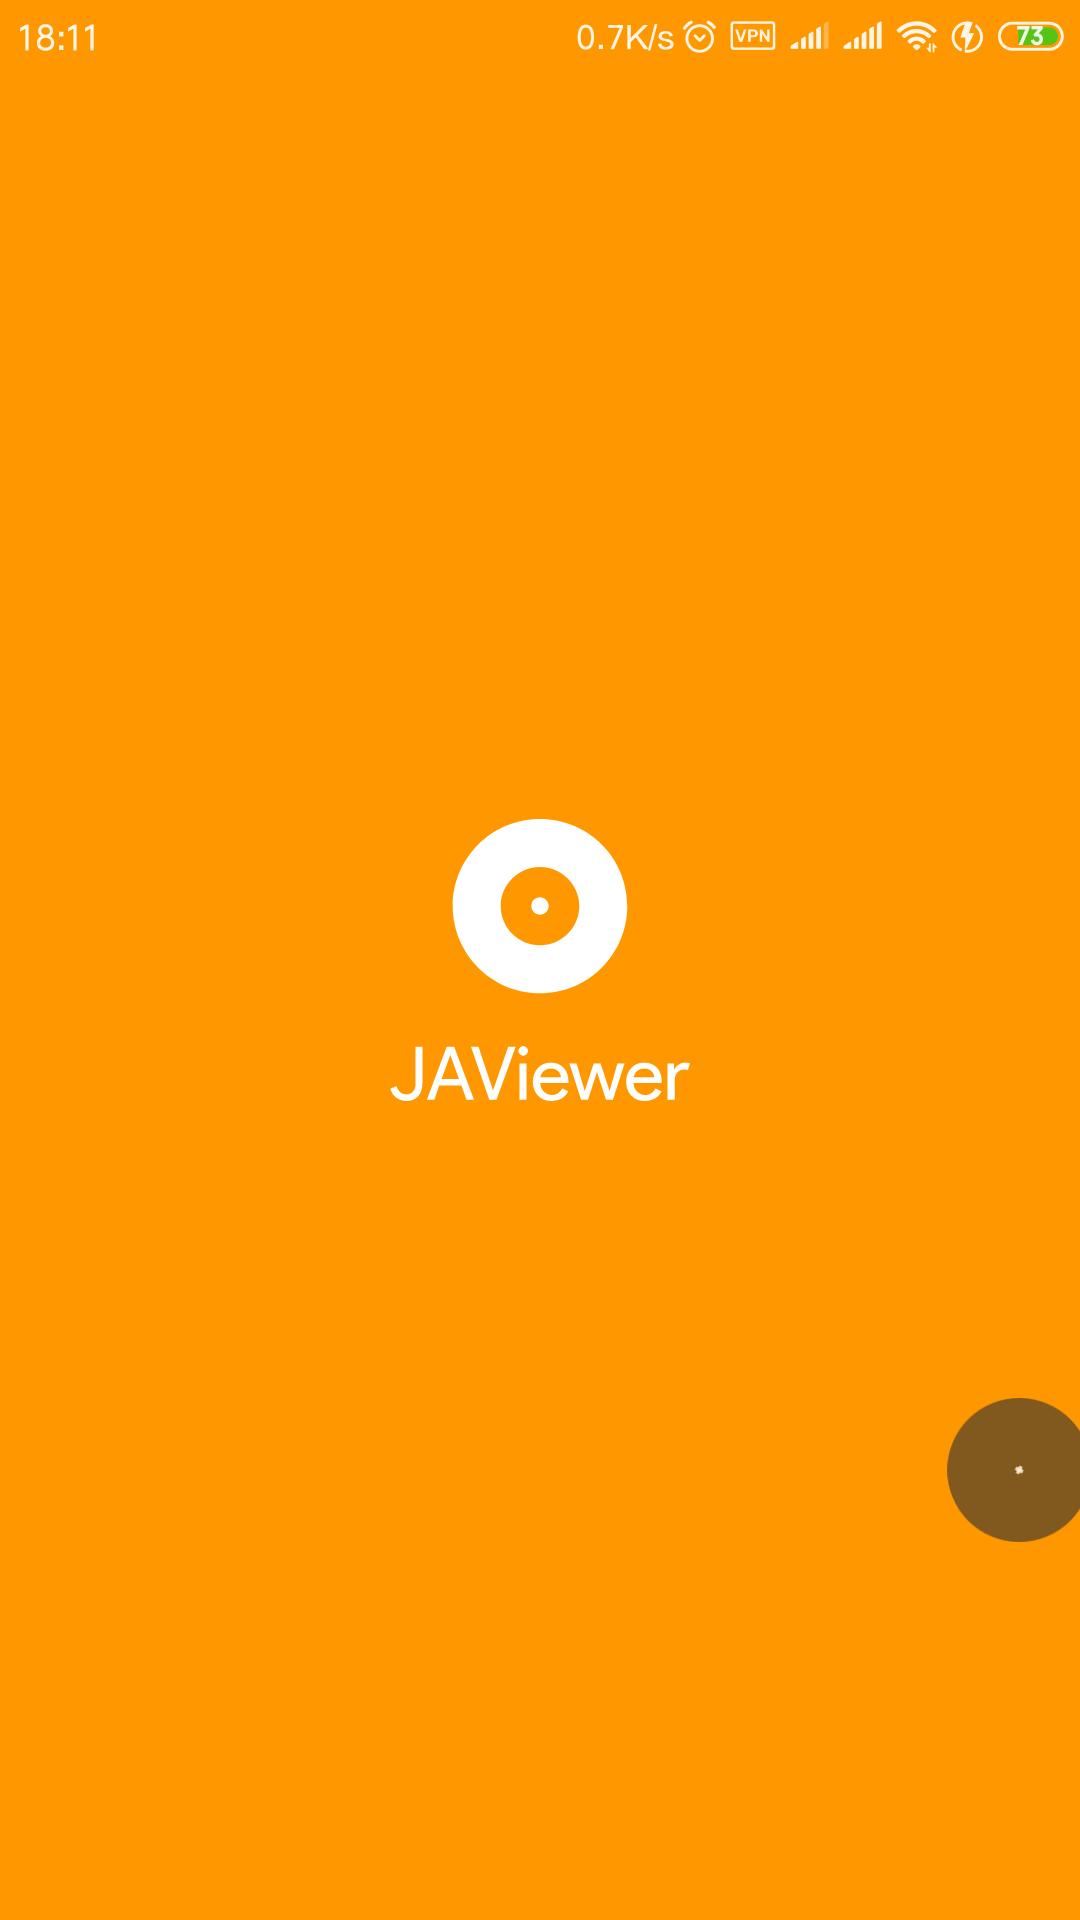 Screenshot_2018-12-21-18-11-47-397_io.github.javiewer.png